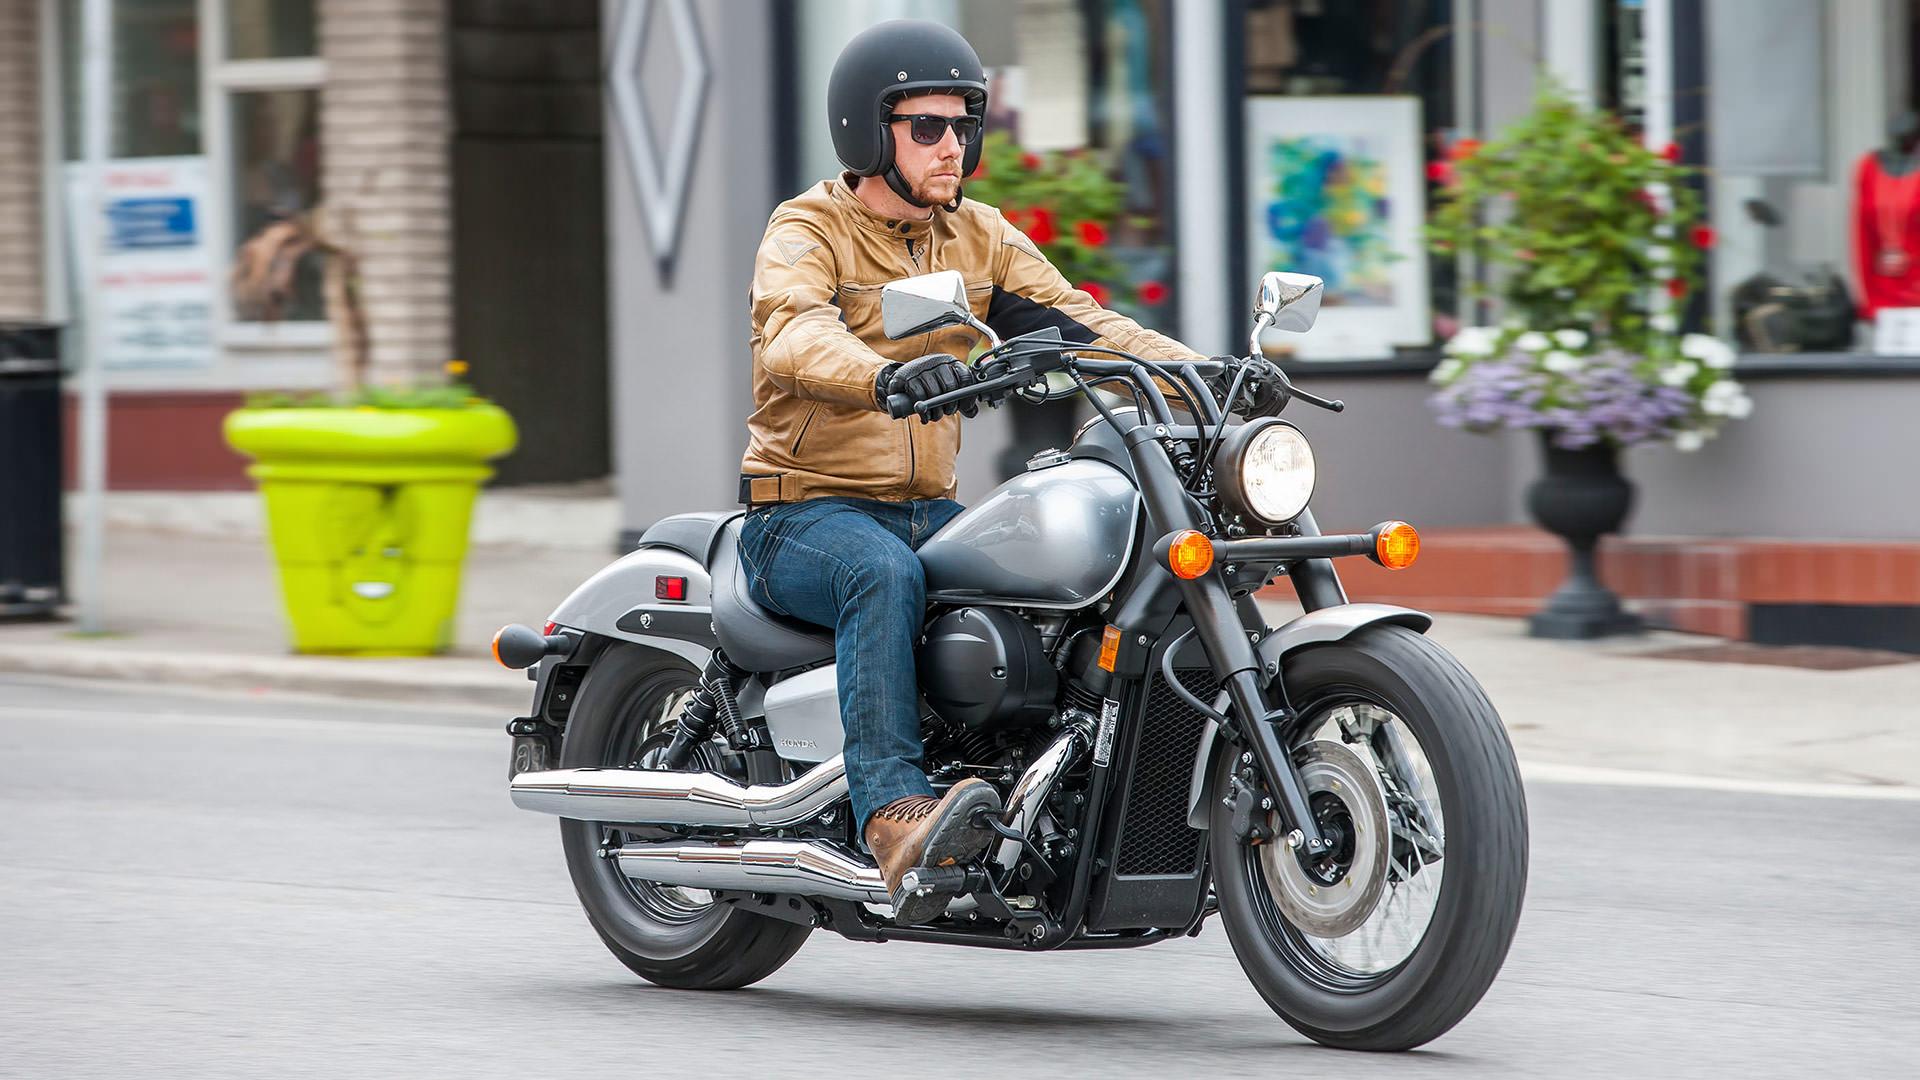 honda shadow phantom  review  specs features blacked  cruiser motorcycle